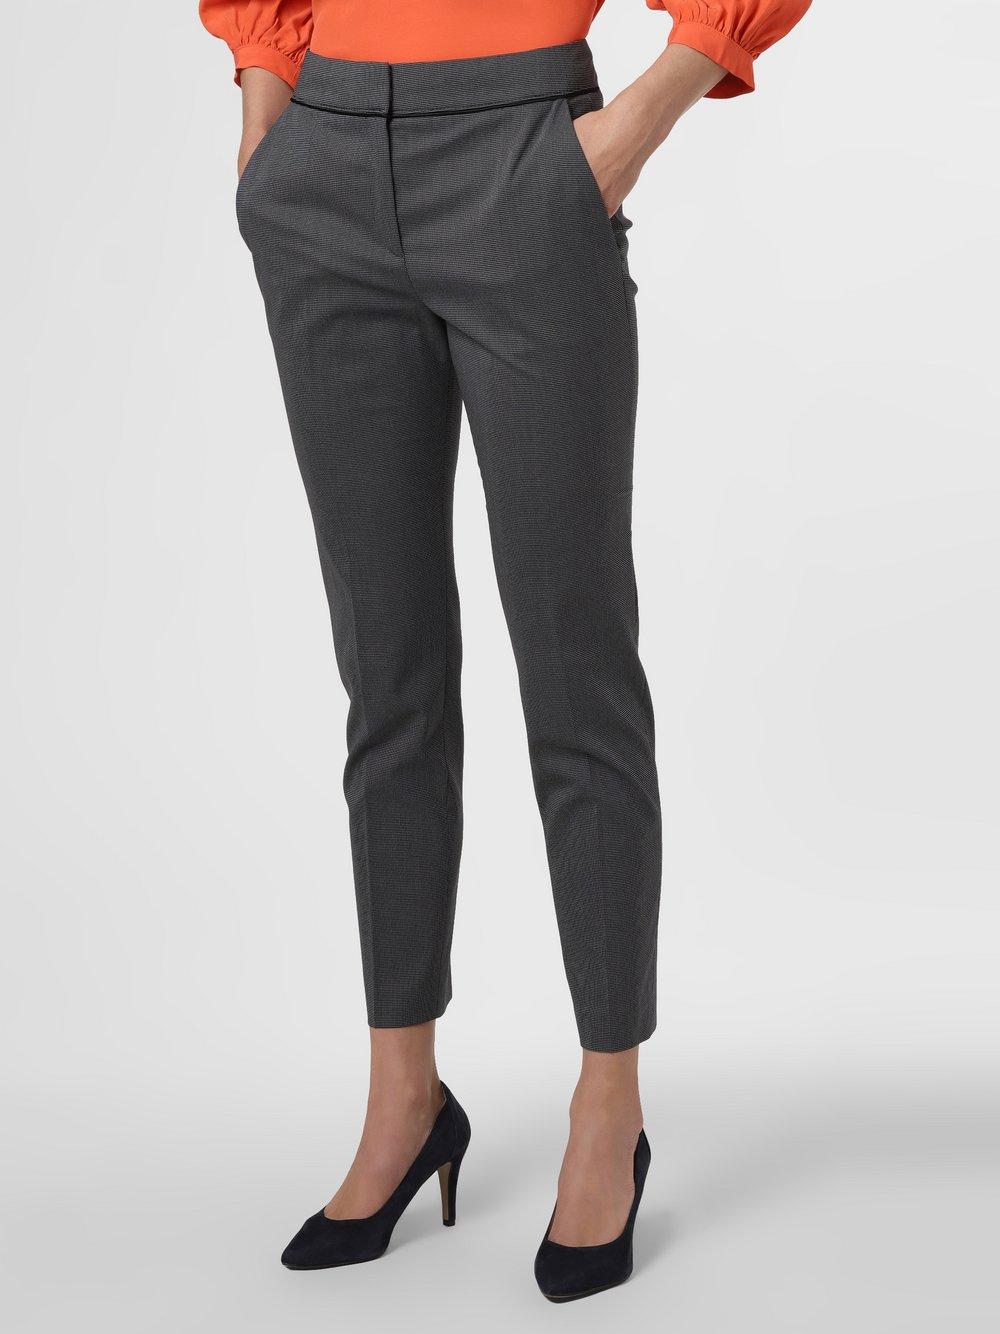 HUGO - Spodnie damskie – The Cropped Trousers, czarny